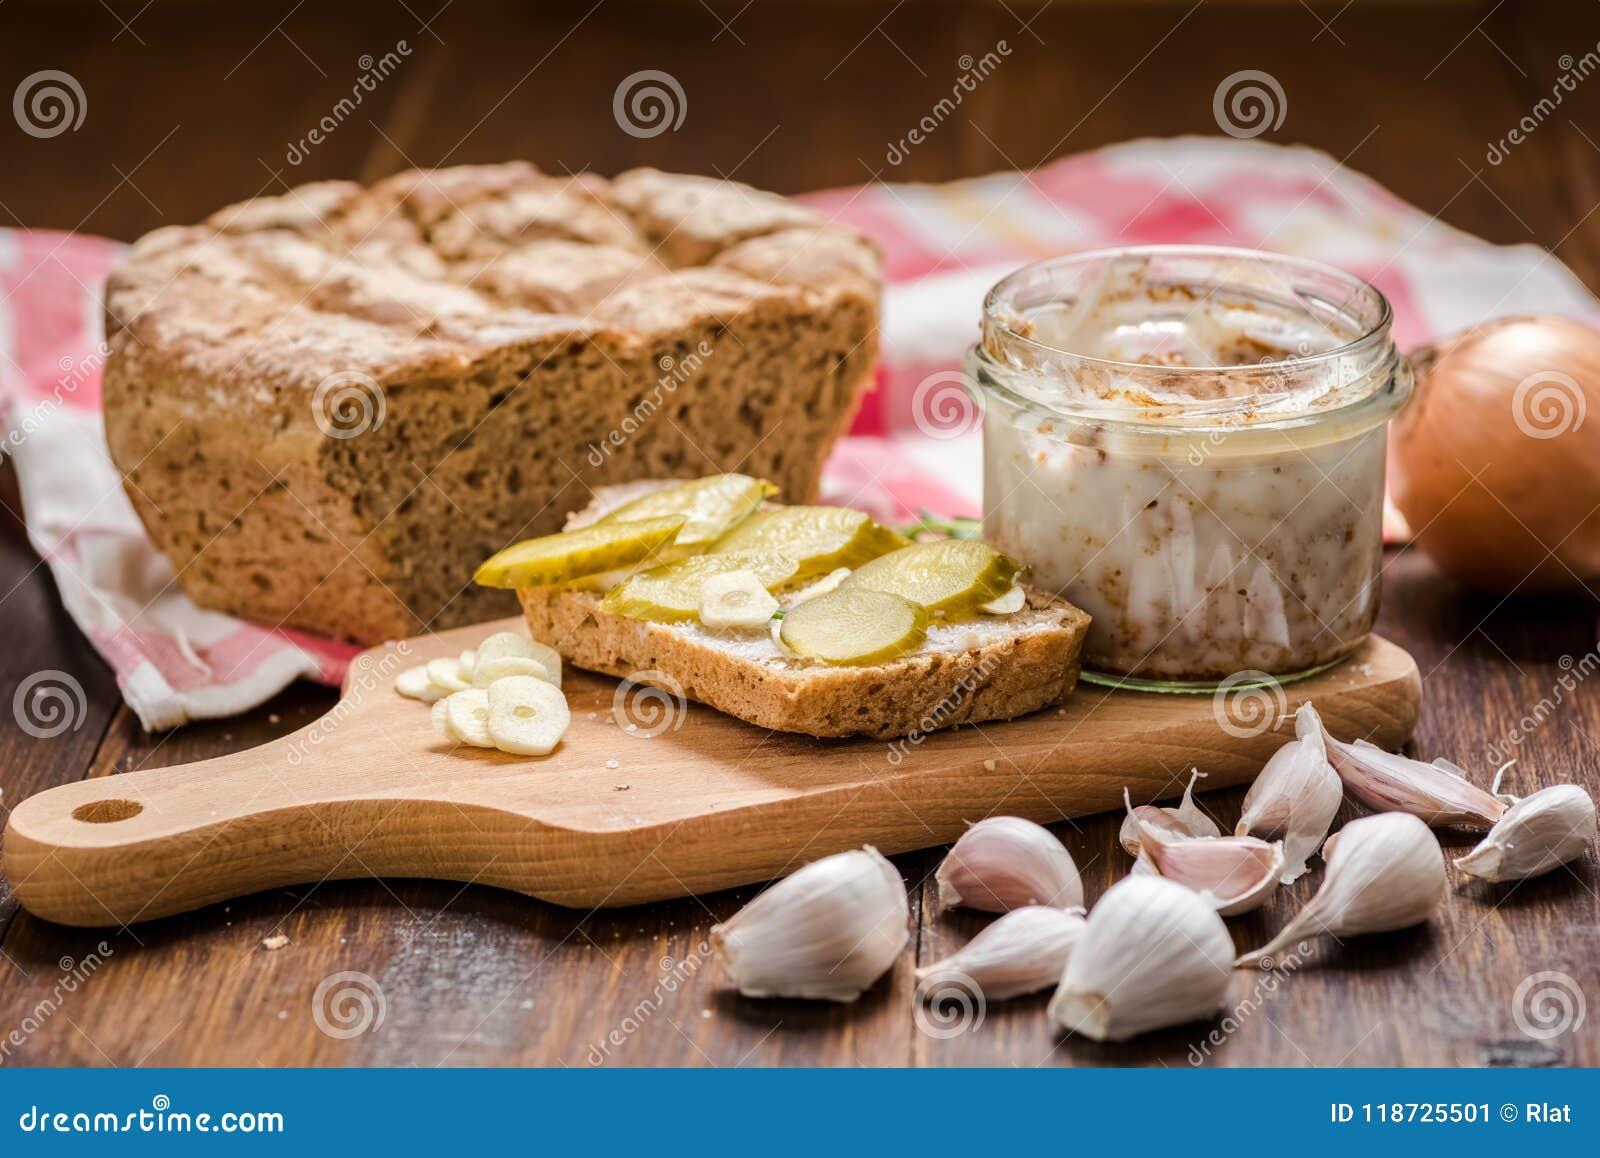 Garlic A Natural Antibiotic Stock Image - Image of eating